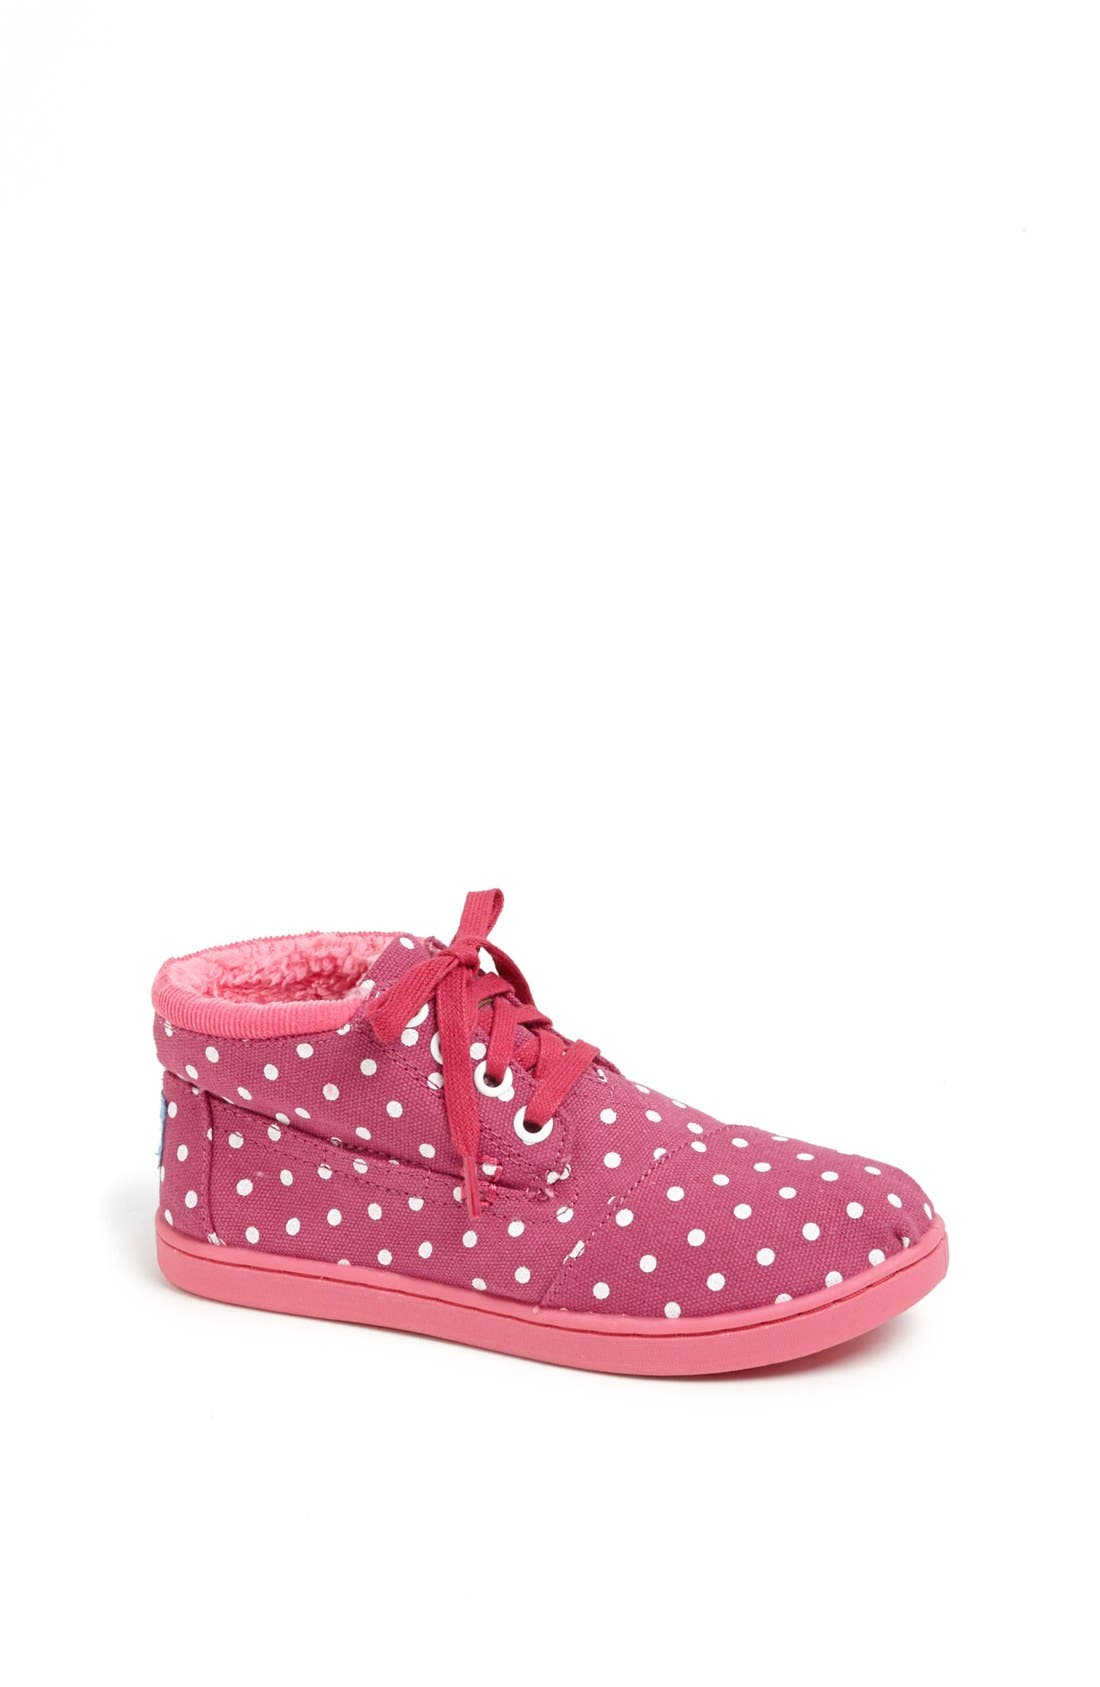 Alternate Image 1 Selected - TOMS 'Botas - Youth' High Top Sneaker (Toddler, Little Kid & Big Kid)